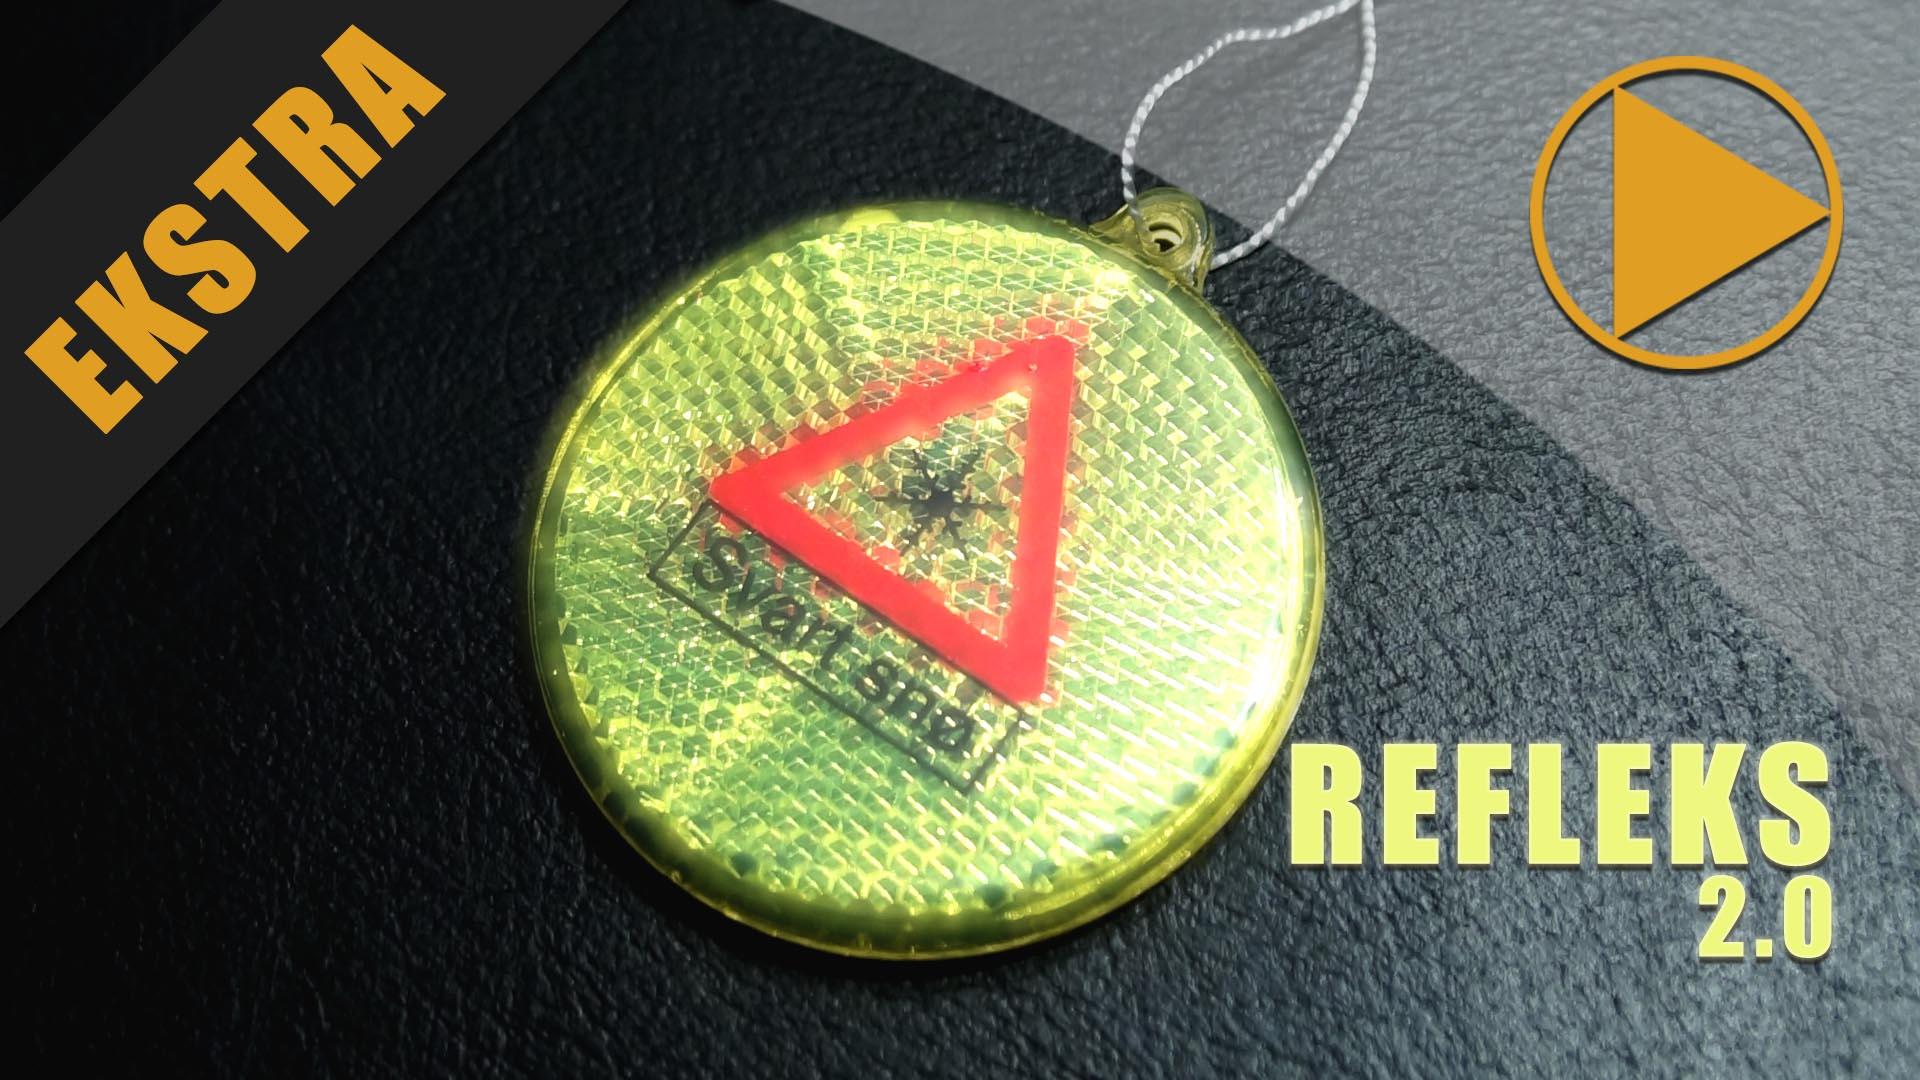 Refleks 2.0